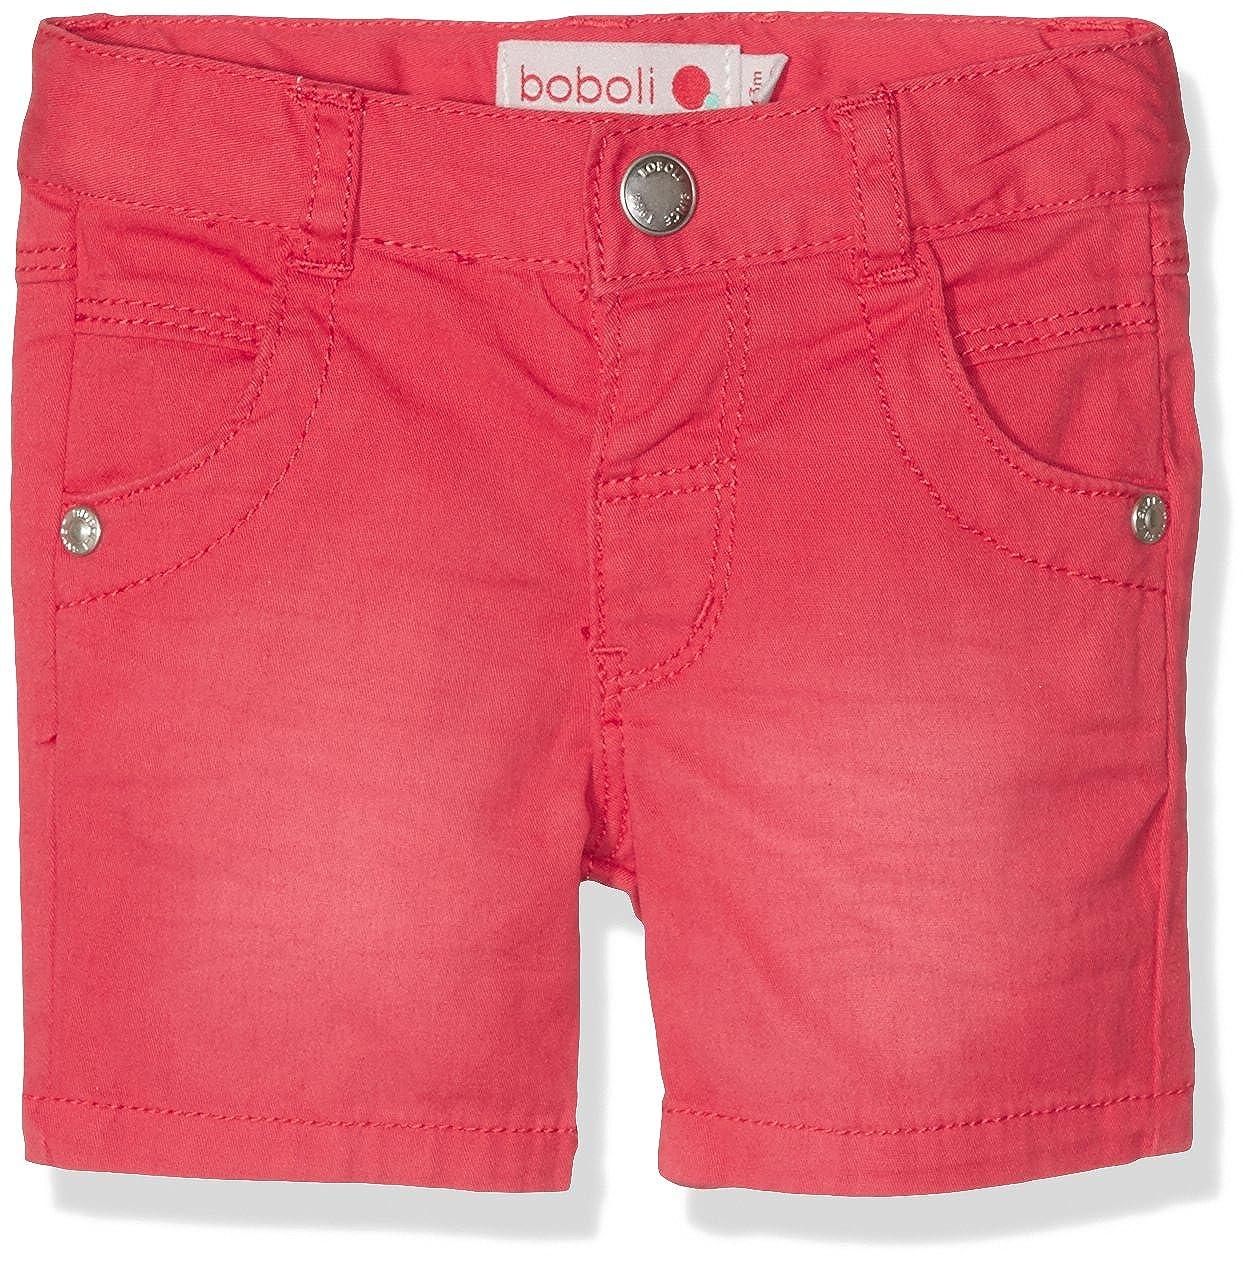 boboli Pantaloncini Bimbo Bóboli 393049